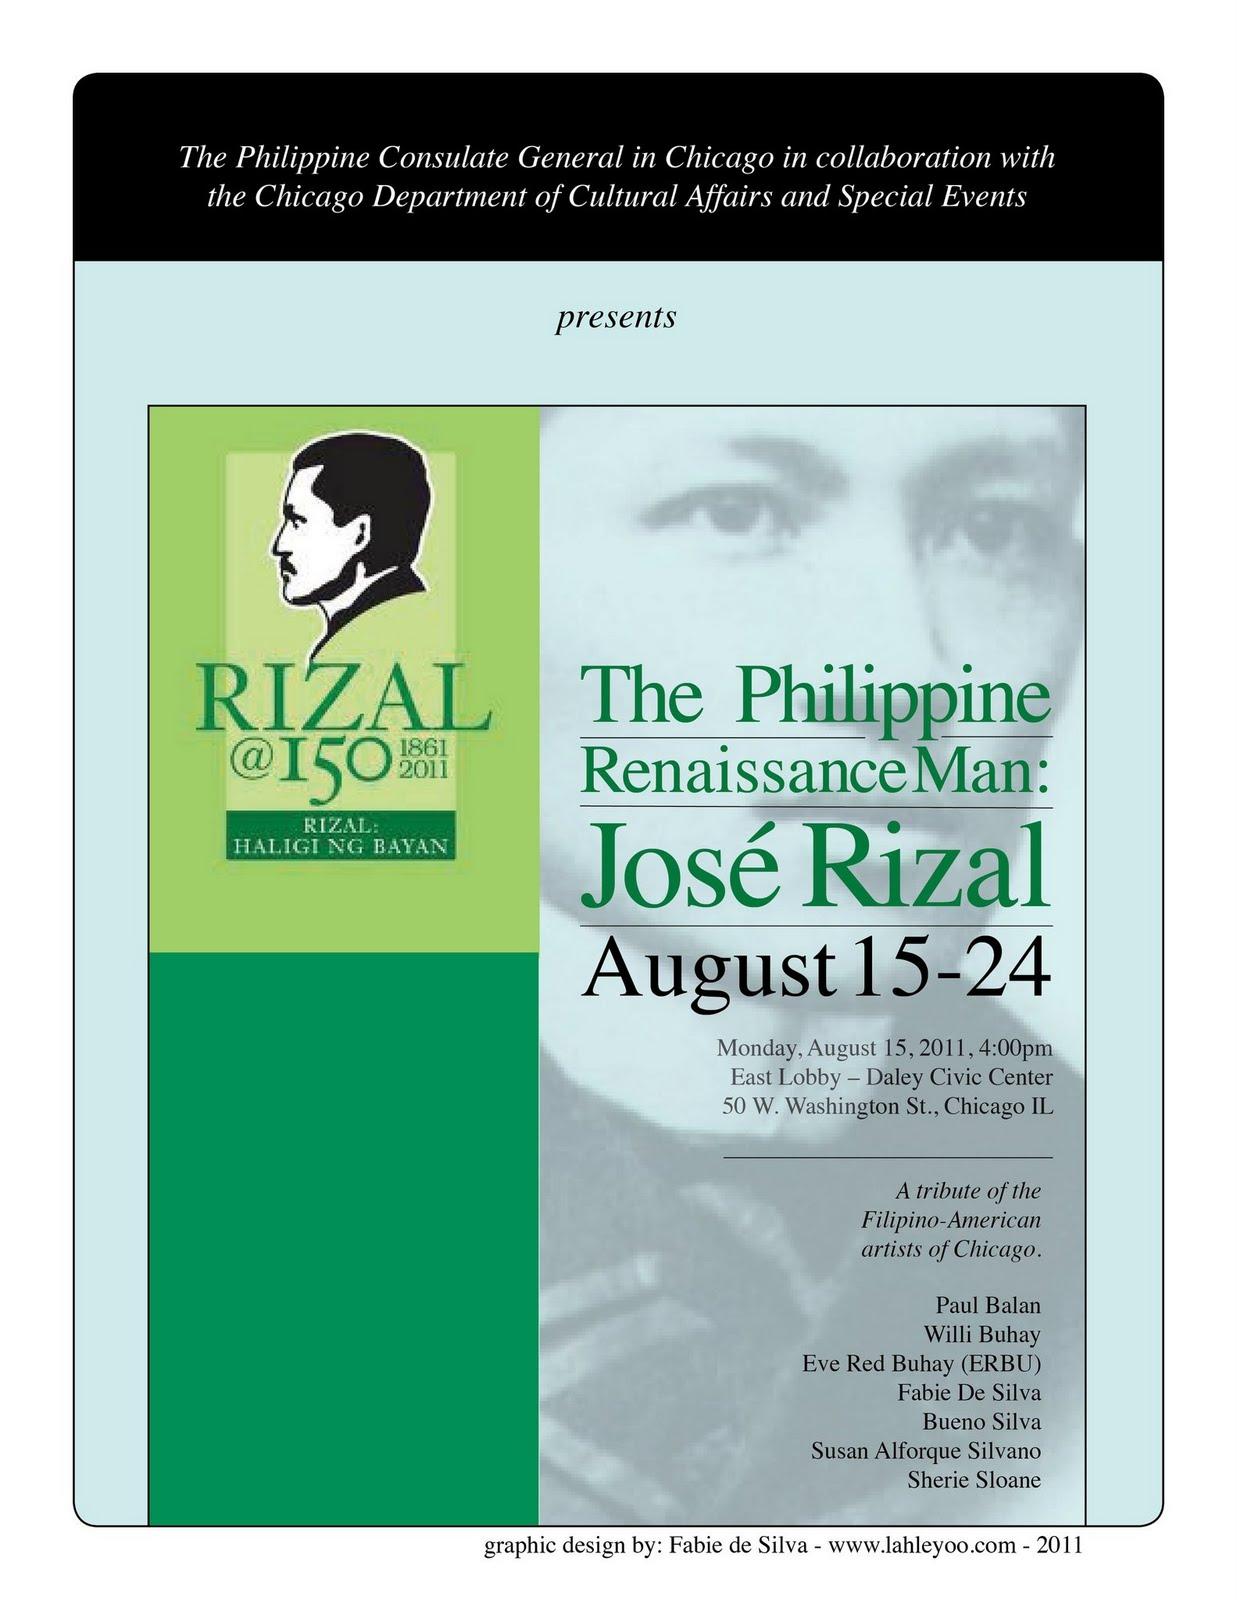 The Morning Artist: Philippine Renaissance Man in Chicago